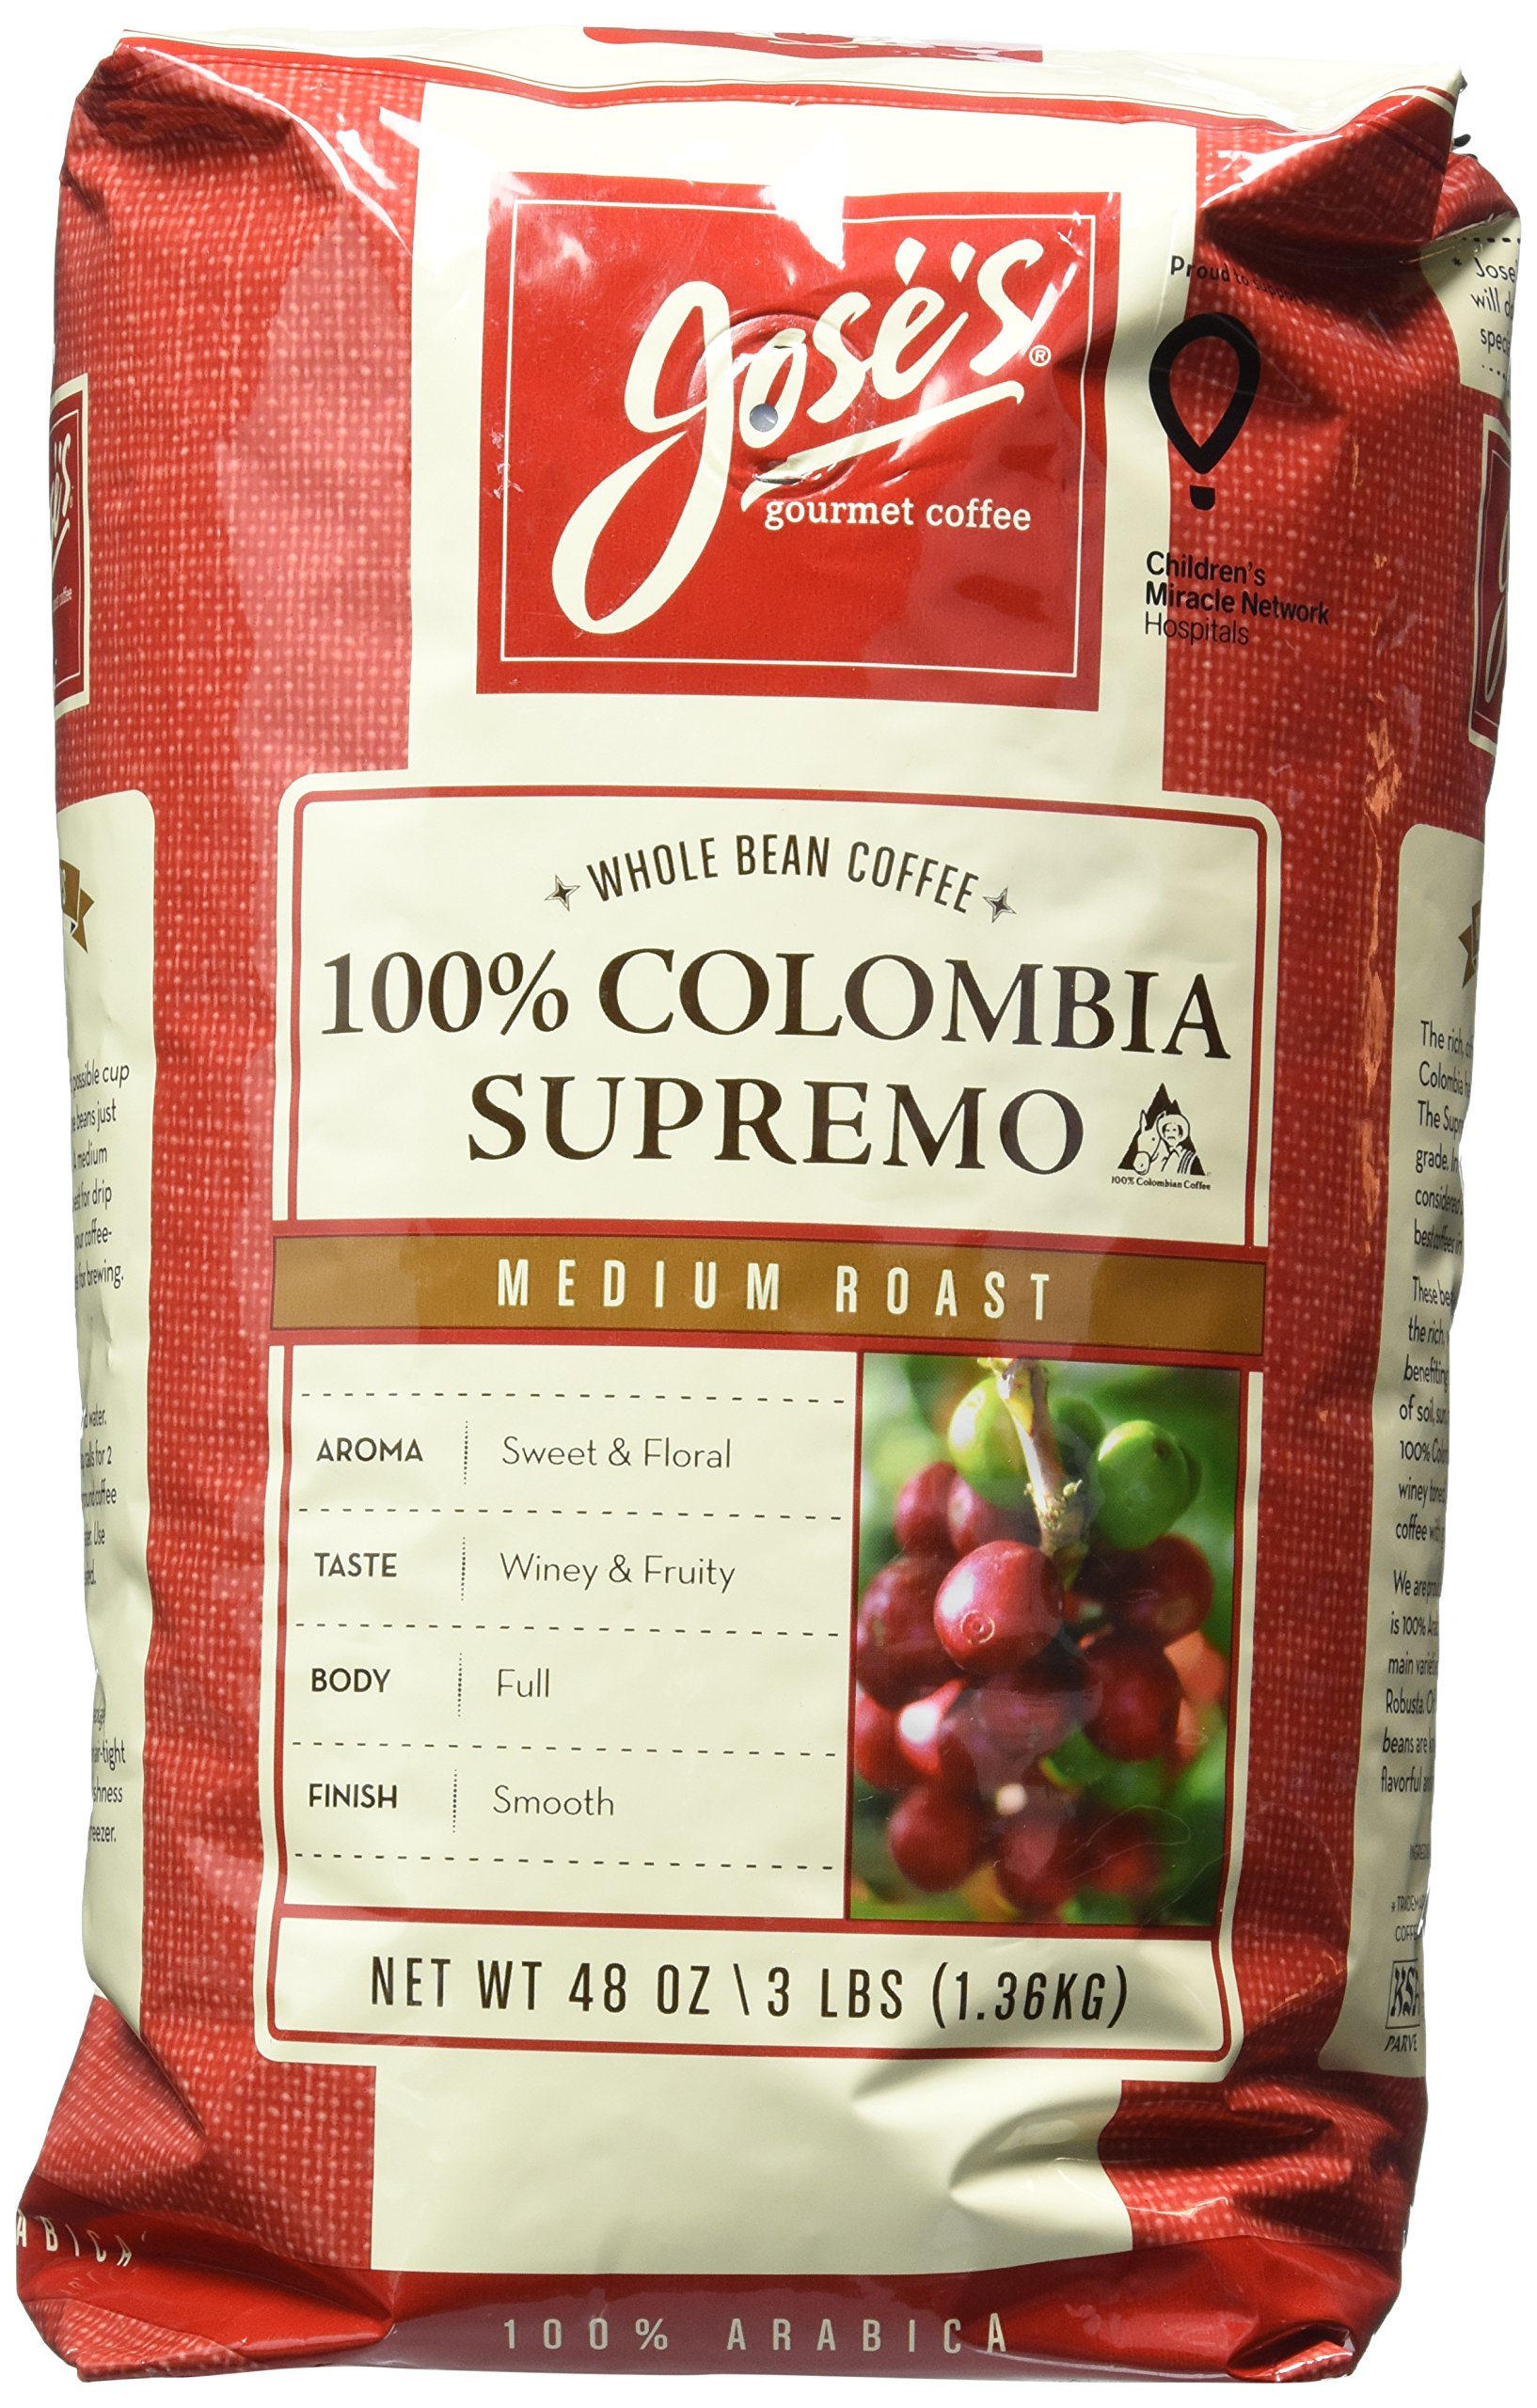 Jose's Whole Bean Coffee Columbia Supremo 3 Lbs